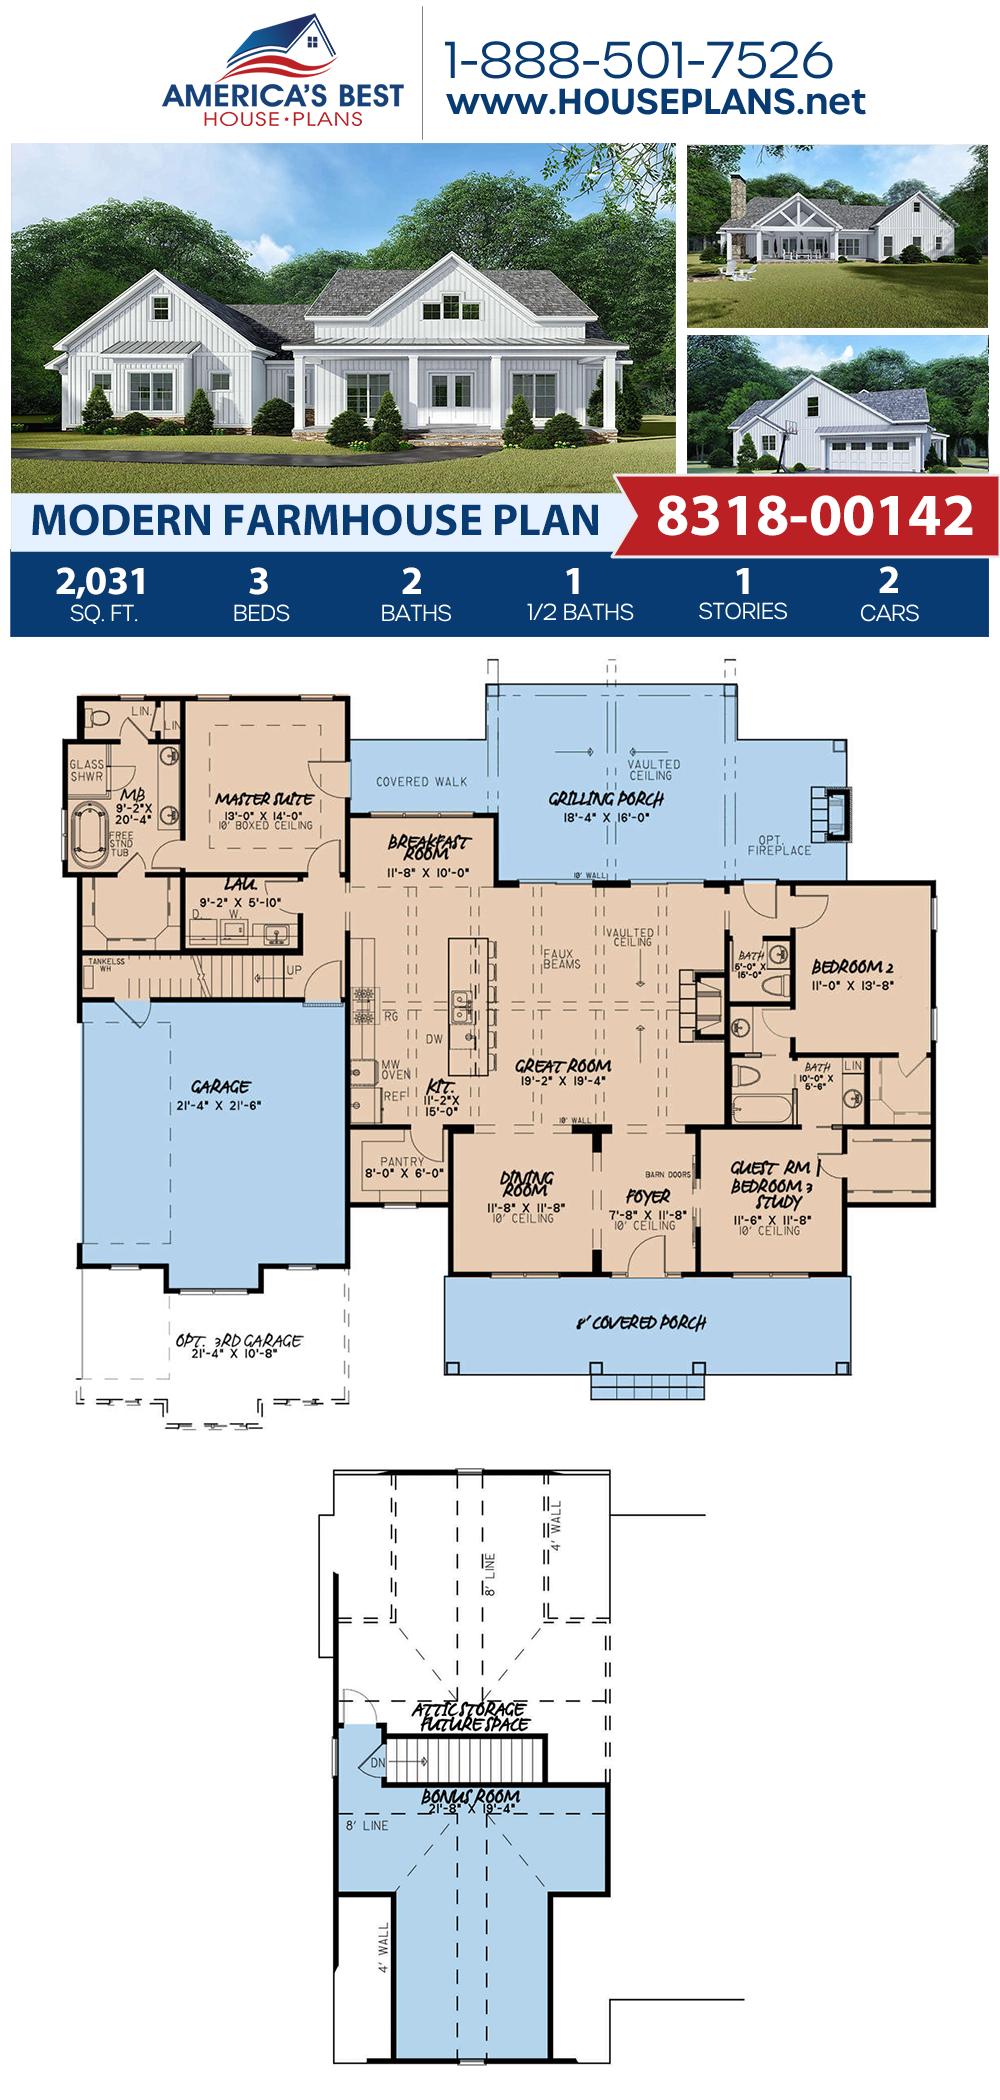 House Plan 8318 00142 Modern Farmhouse Plan 2 031 Square Feet 3 Bedrooms 2 5 Bathrooms Modern Farmhouse Plans Farmhouse Plans House Plans Farmhouse